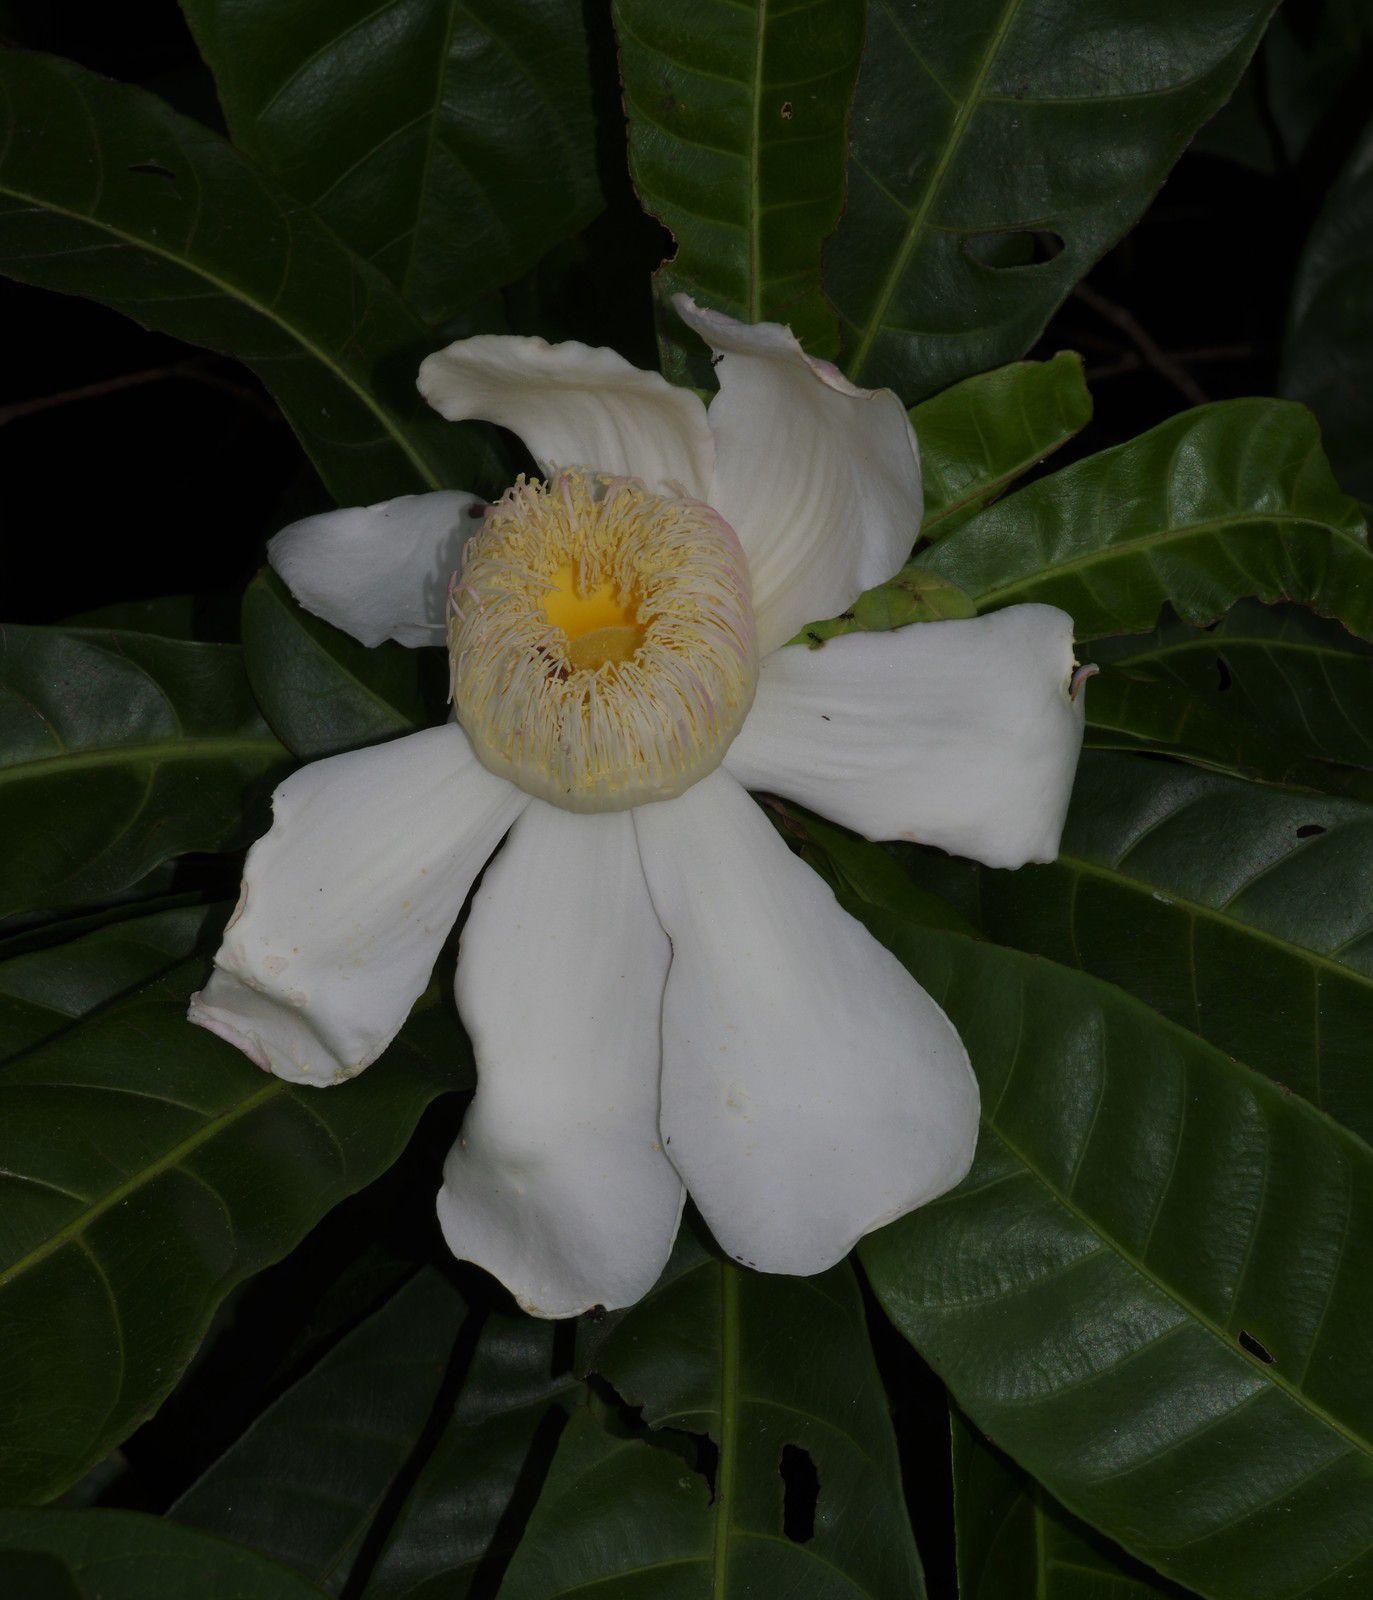 Gustavia augusta (bois pian)